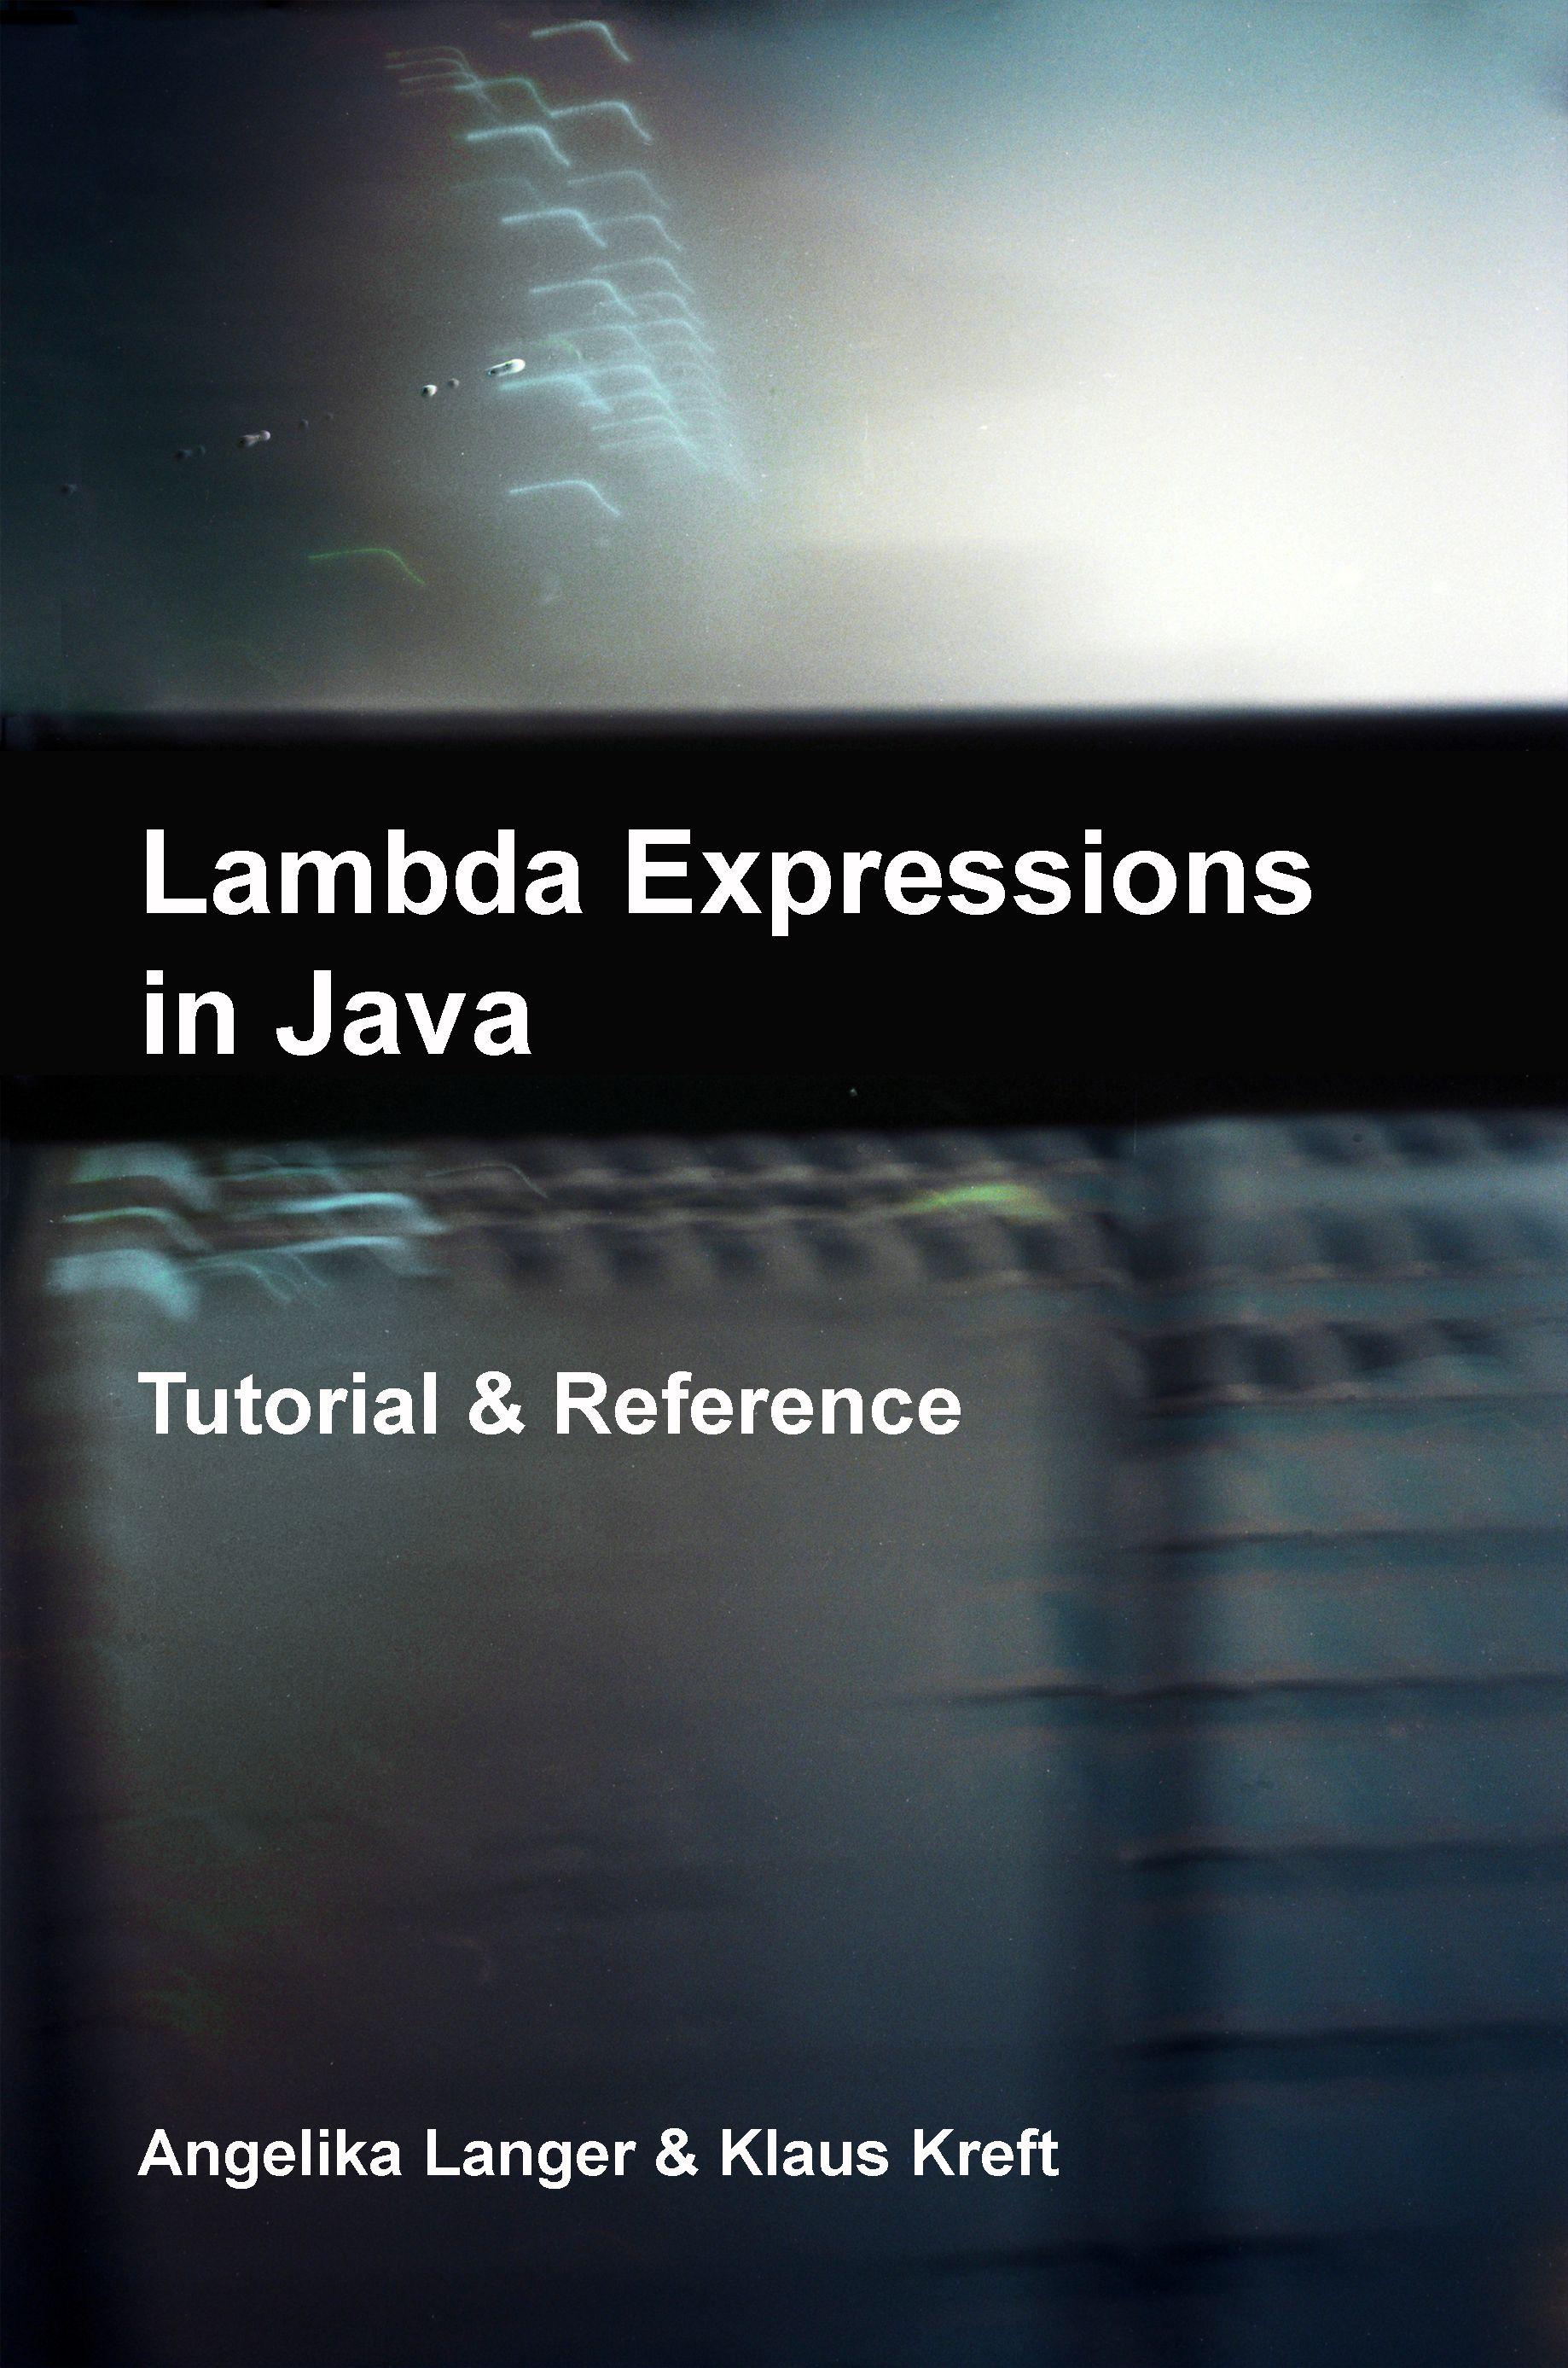 Lambda Expressions in Java